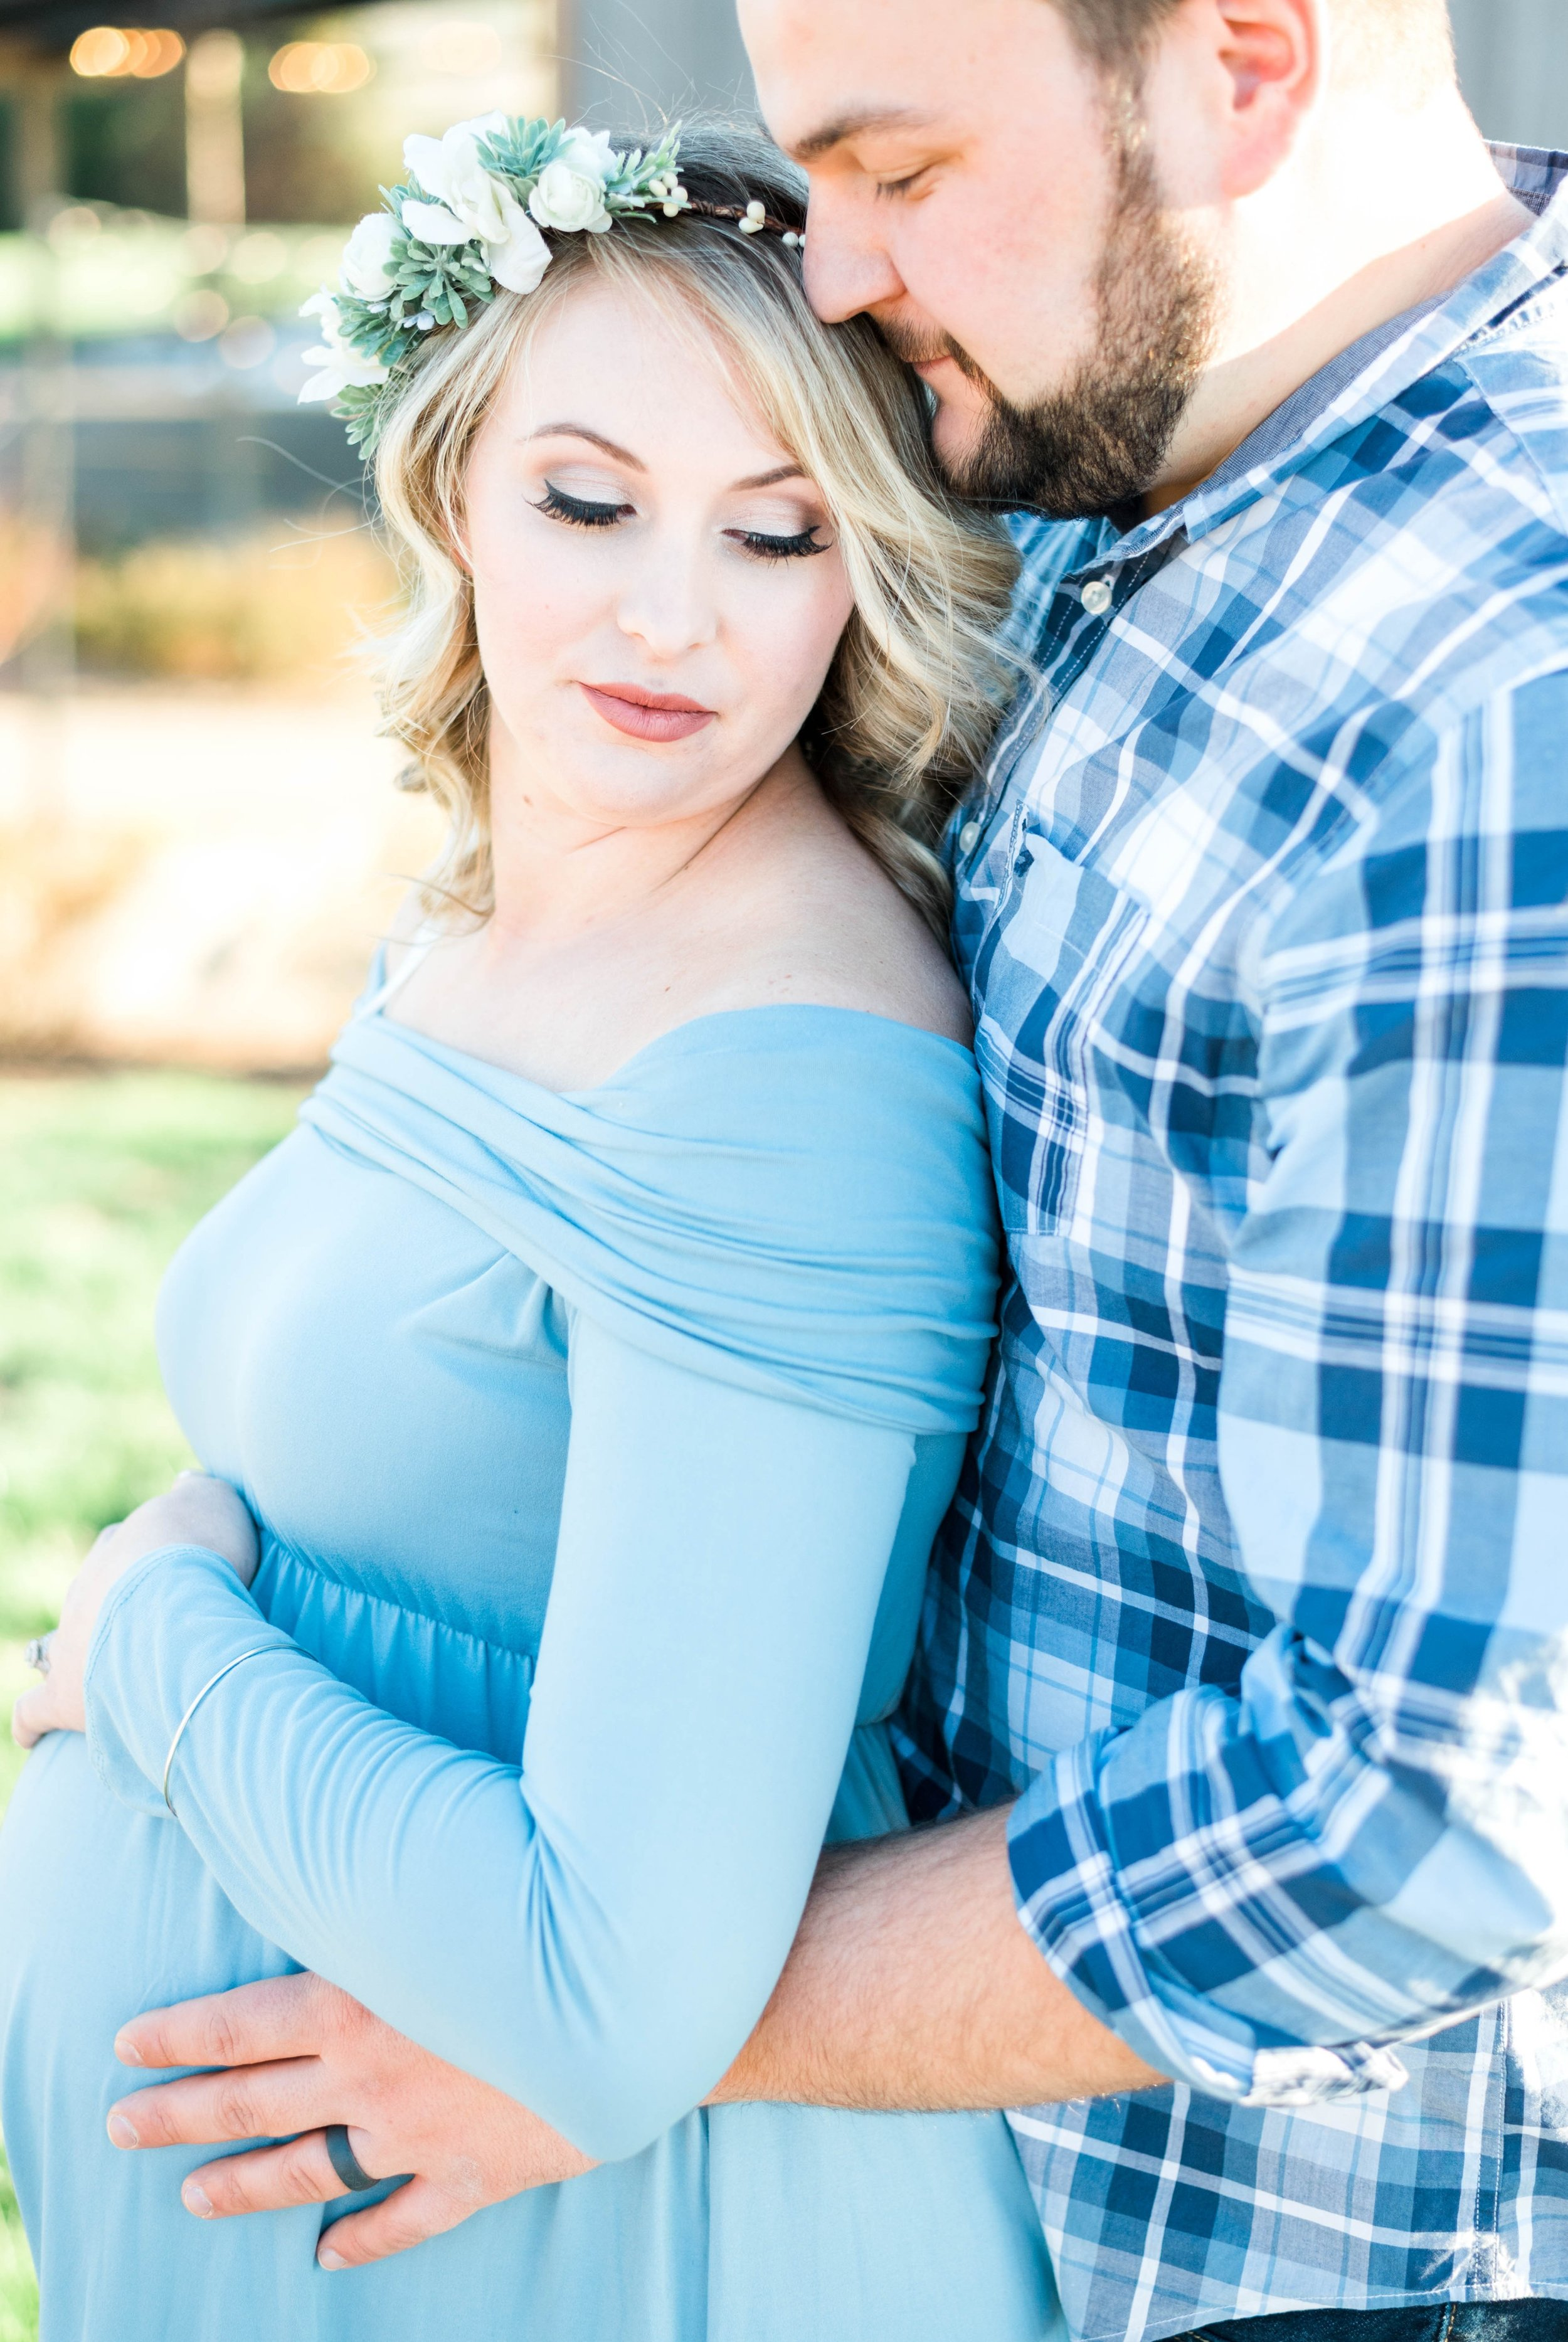 SorellaFarms_Jessica+Dylan_MaternitySession_Virginiaweddingphotographer 20.jpg